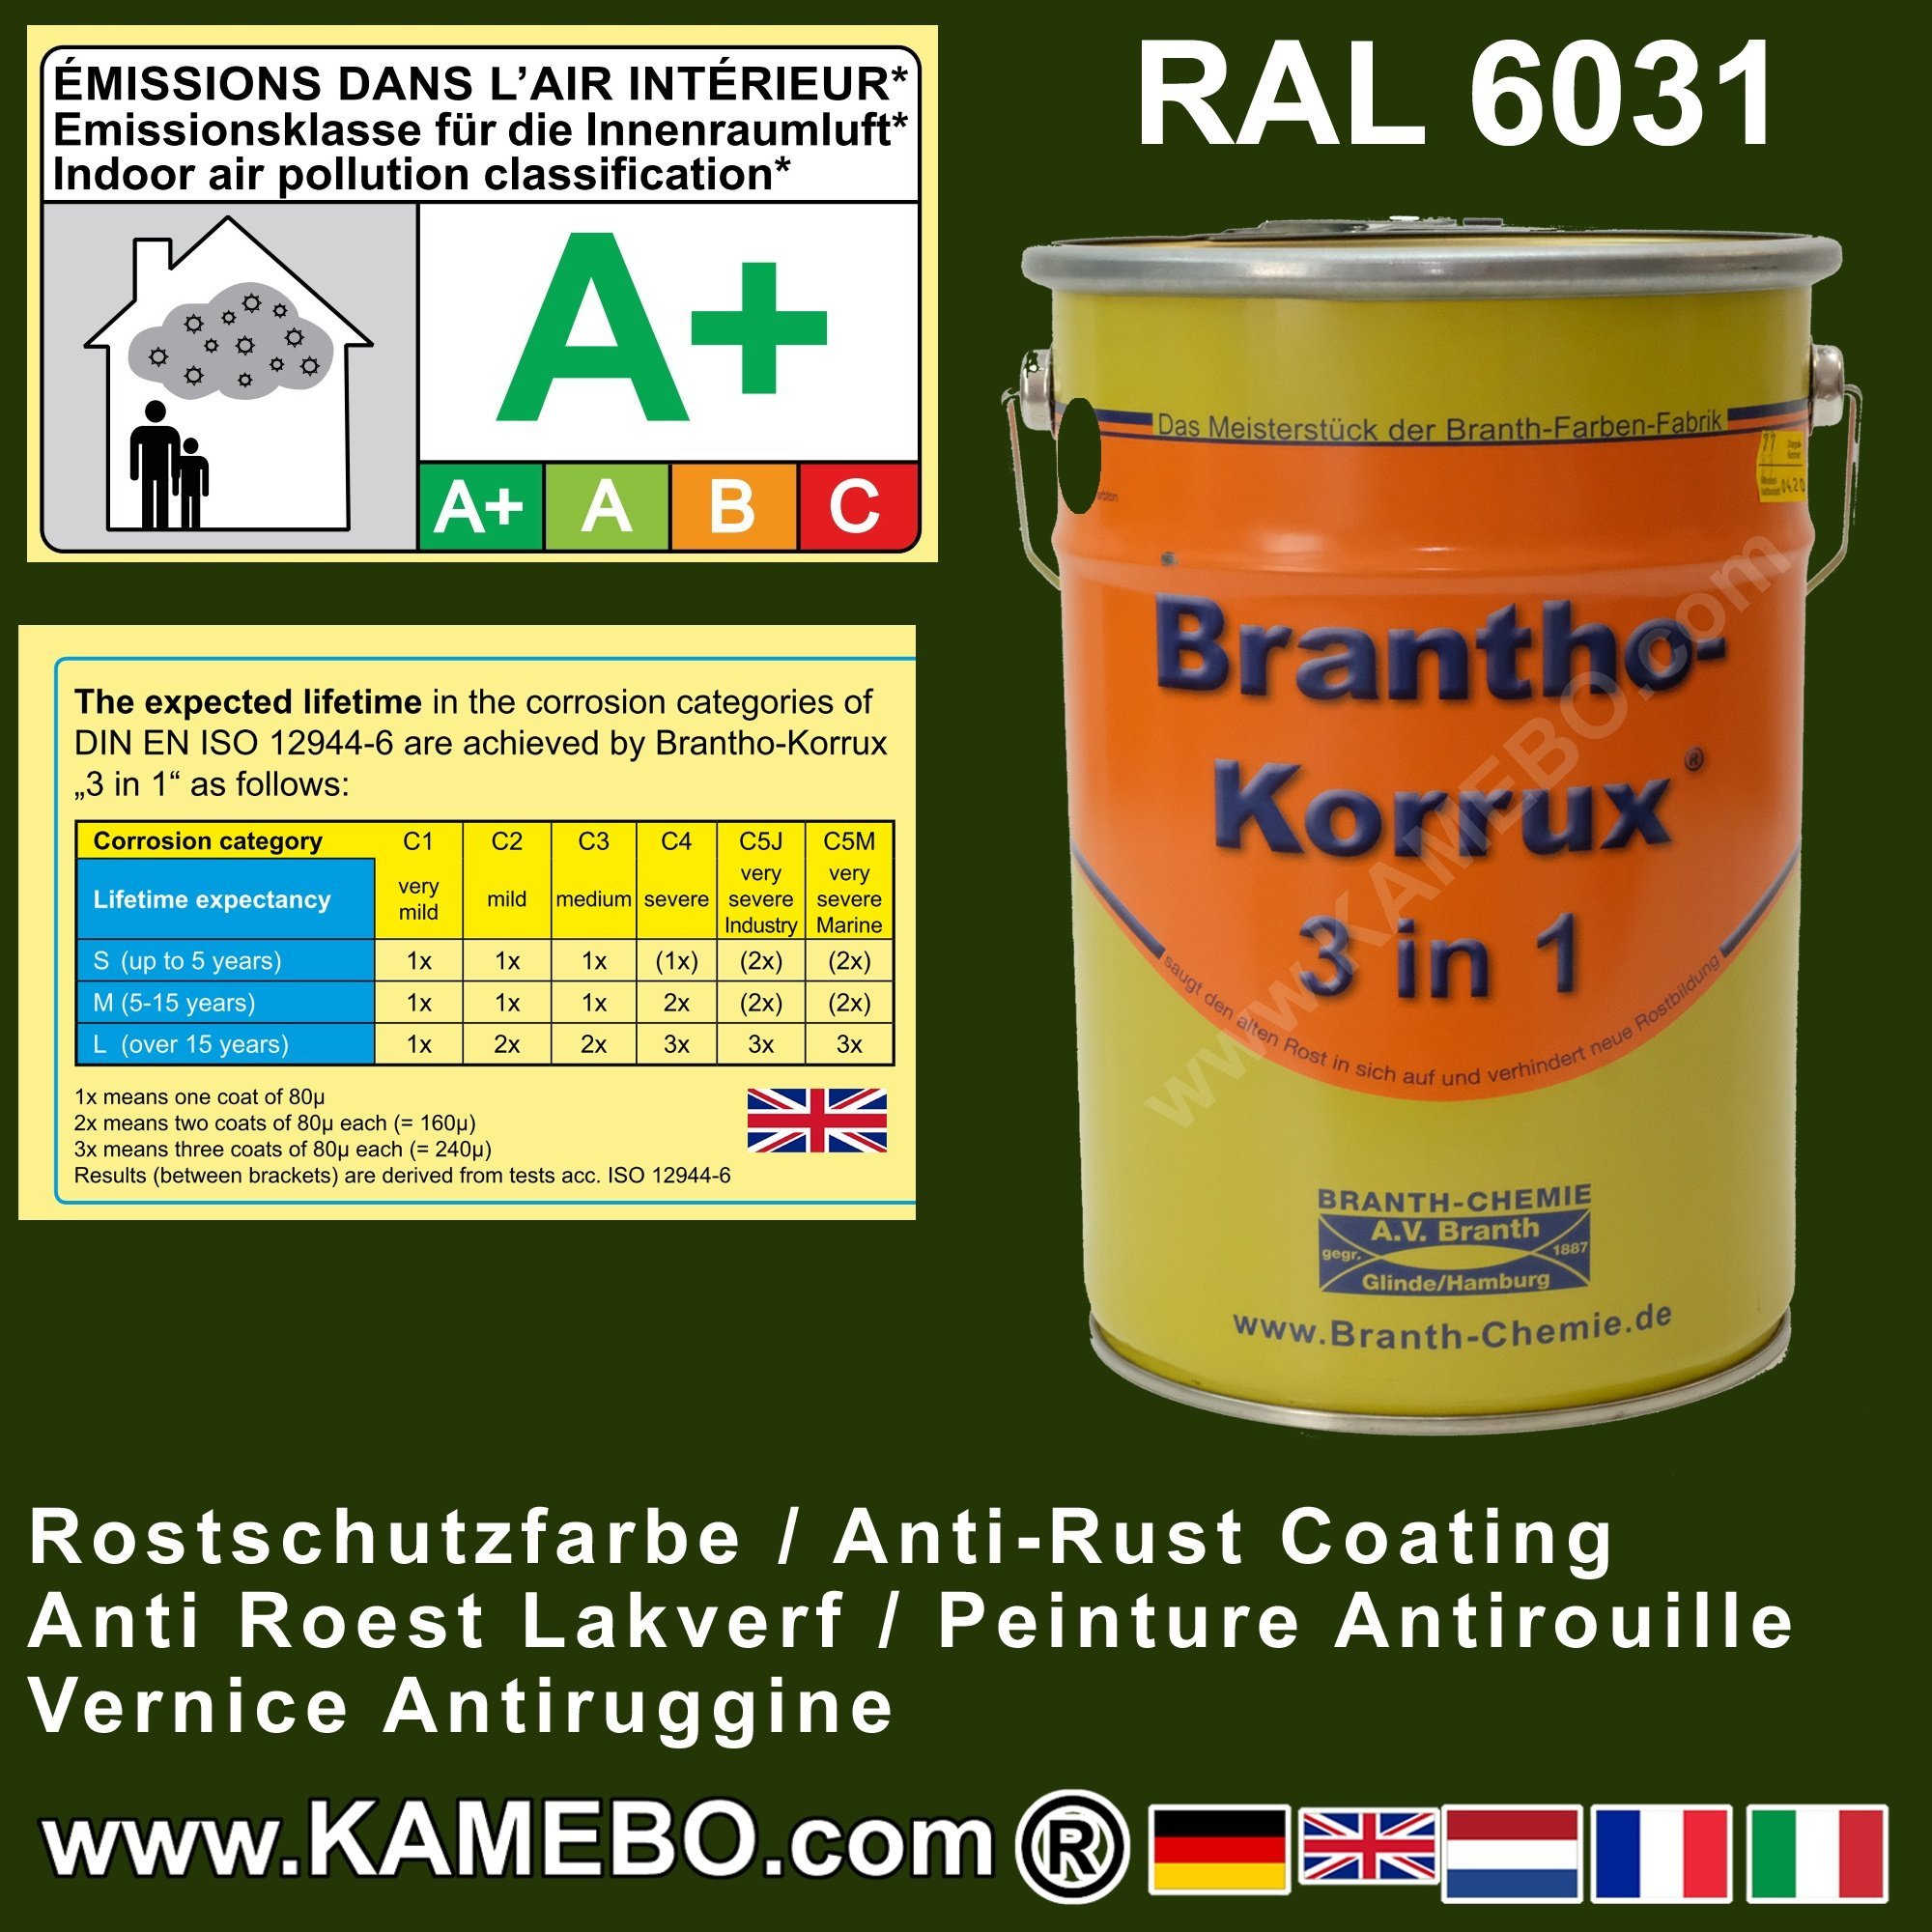 brantho korrux 3 in 1 rostschutzfarbe tarnfarbe ral 6031 bronzegr n 5 liter. Black Bedroom Furniture Sets. Home Design Ideas